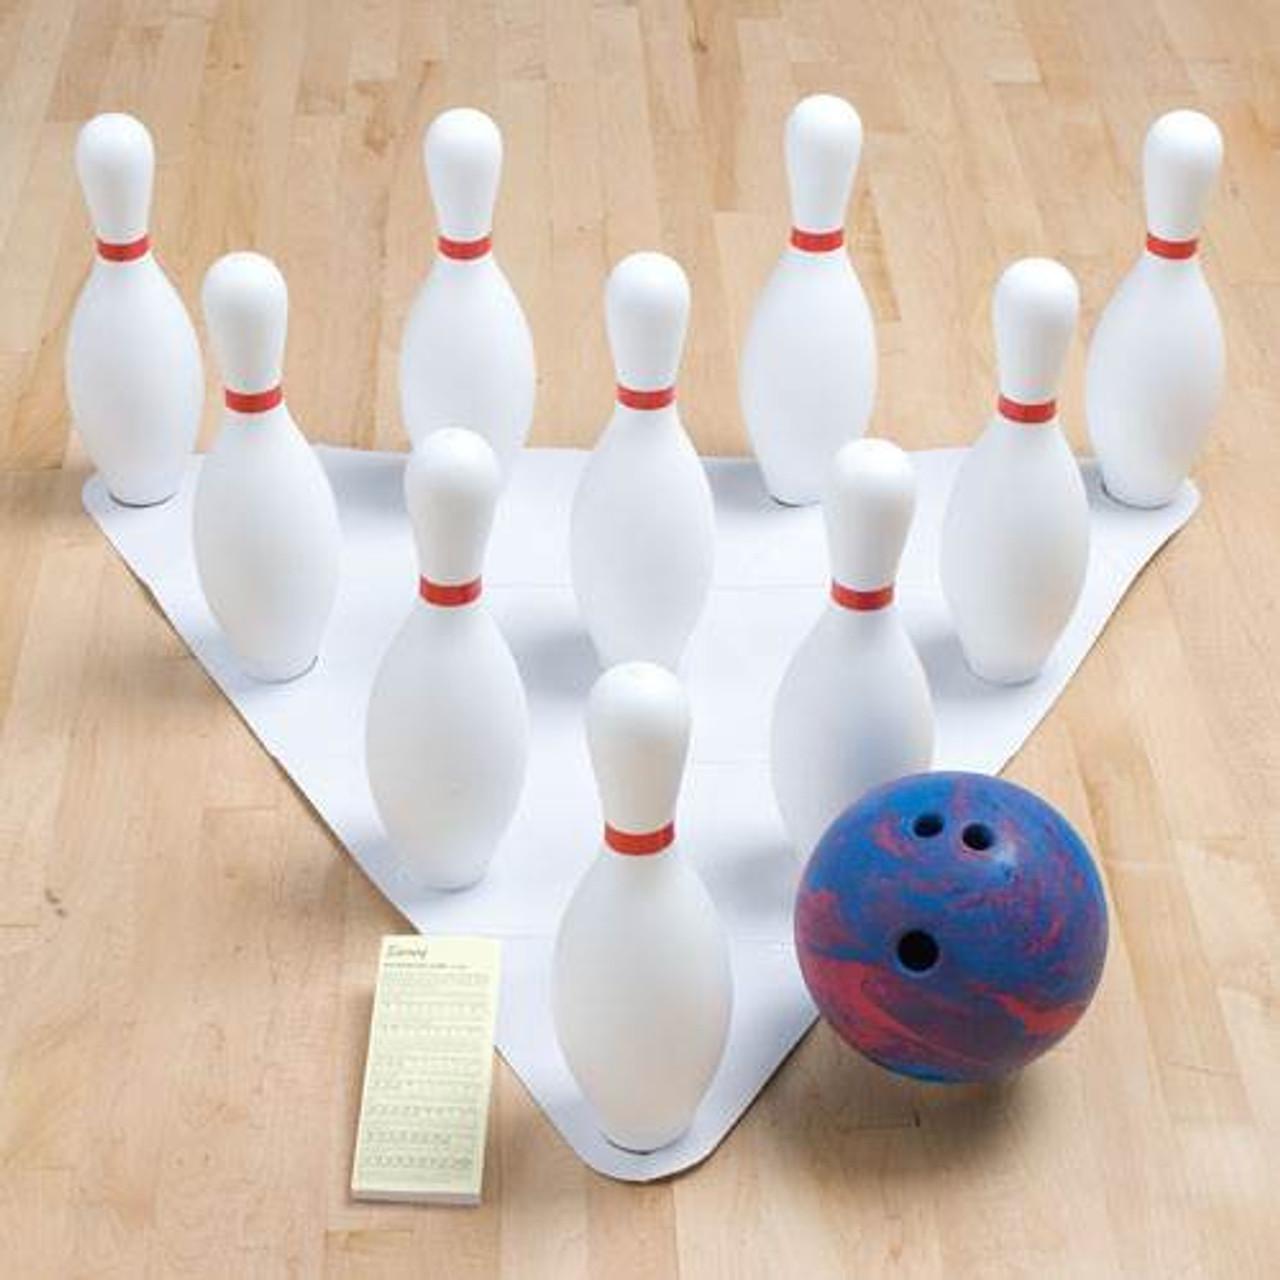 GameCraft® Weighted Bowling Set